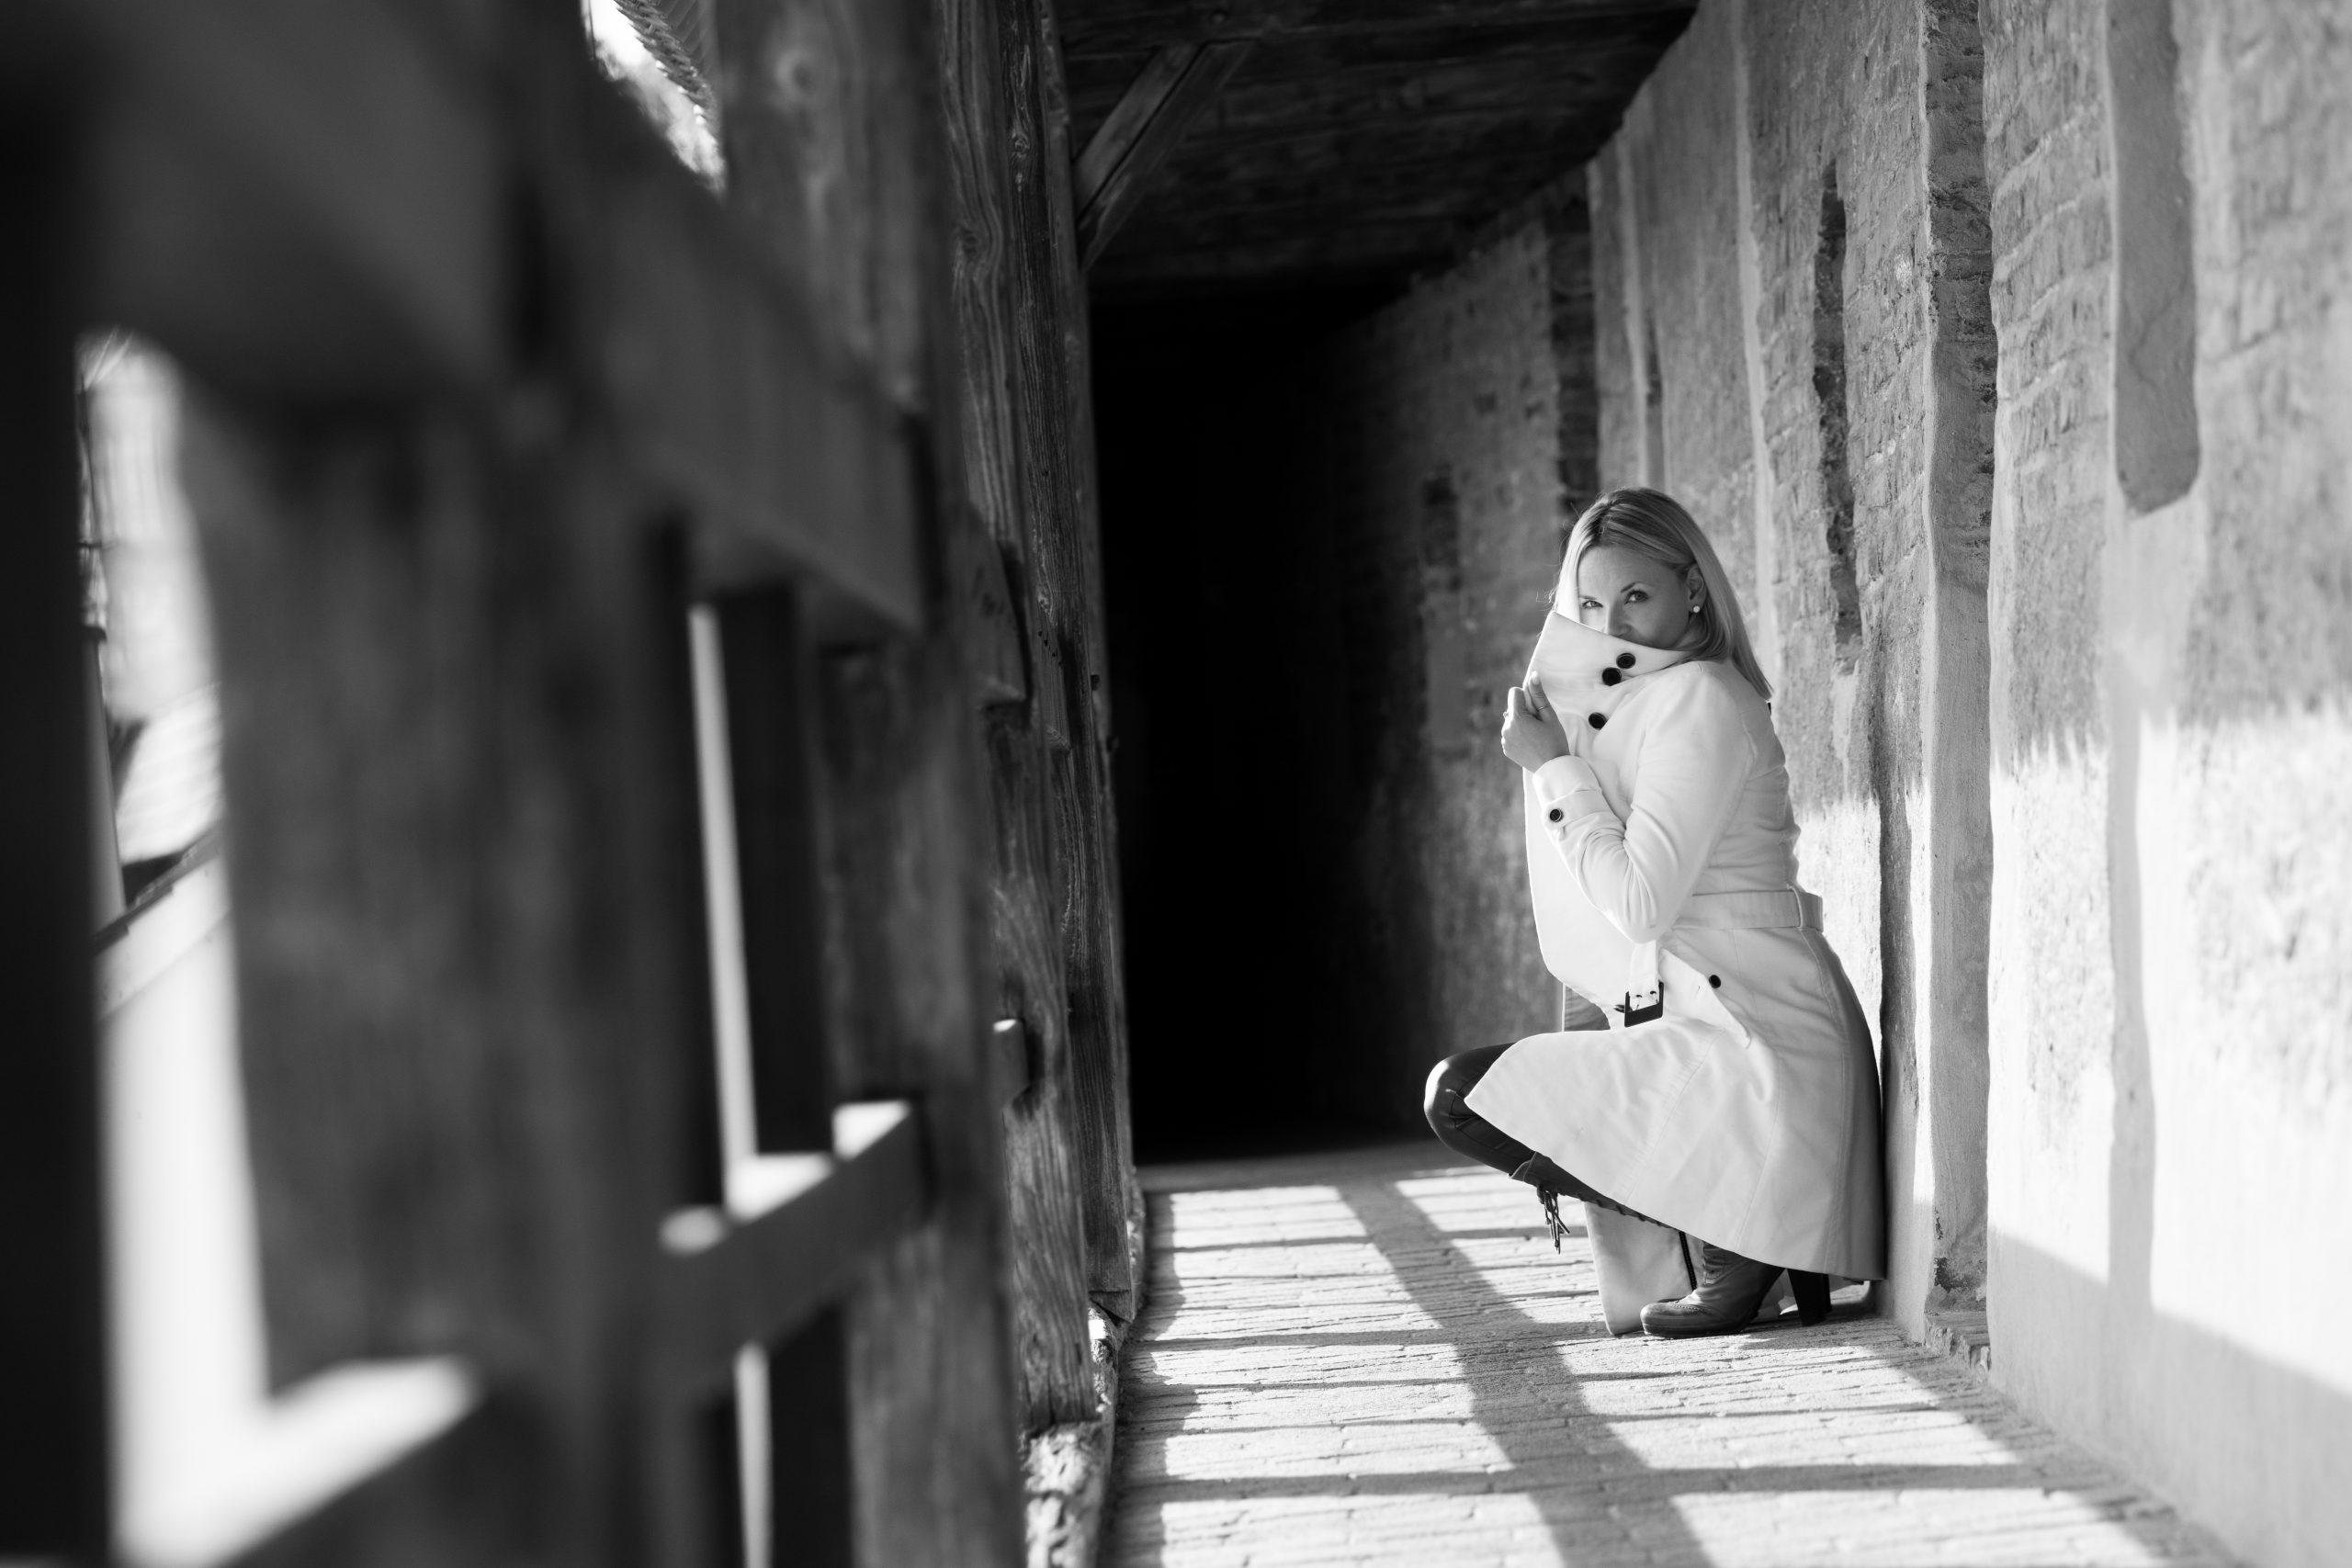 franziska_schneider_fotografie_portrait_19